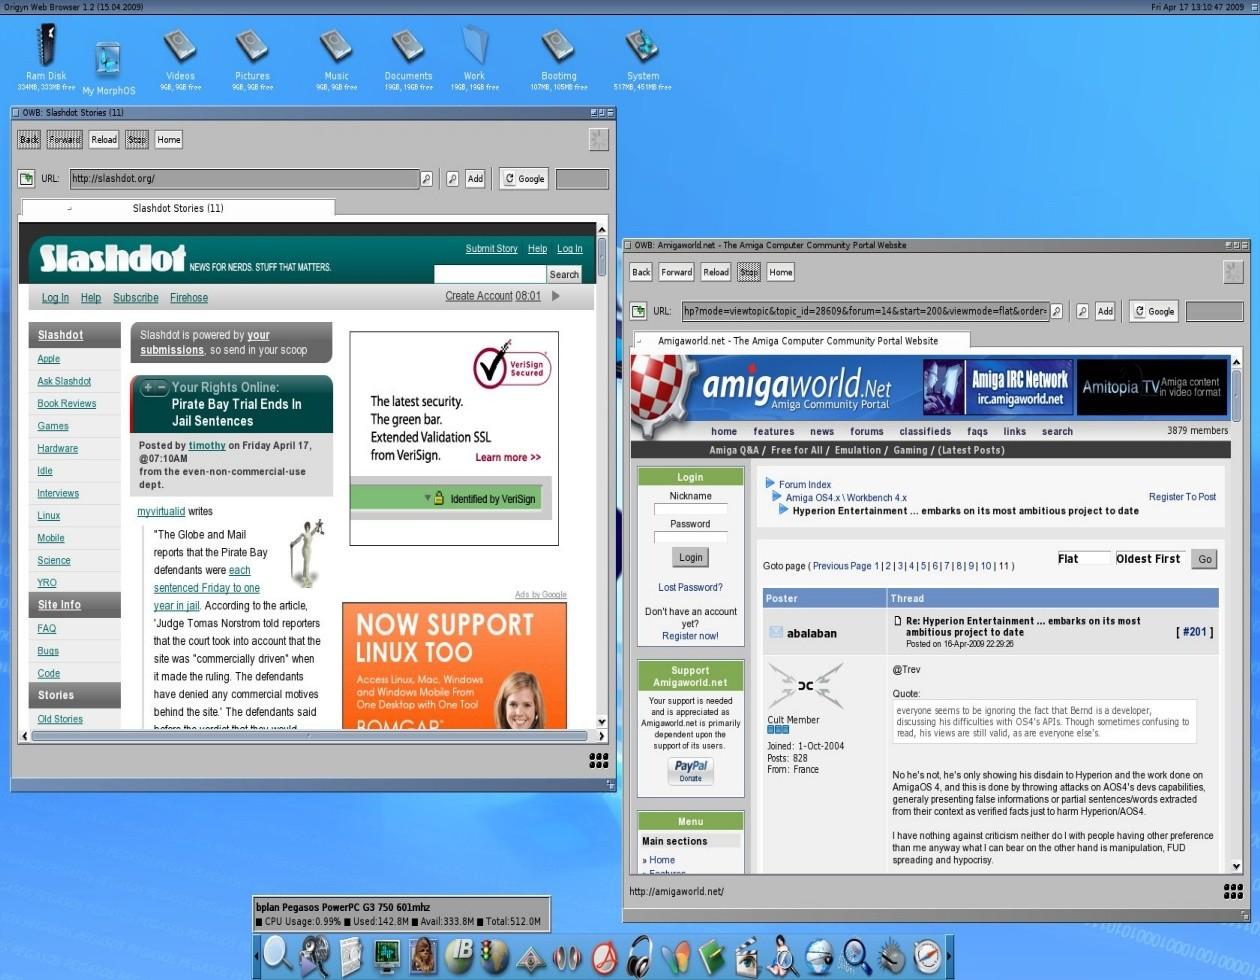 Browsing Slashdot and AmigaWorld with MorphOS OWB 1.2